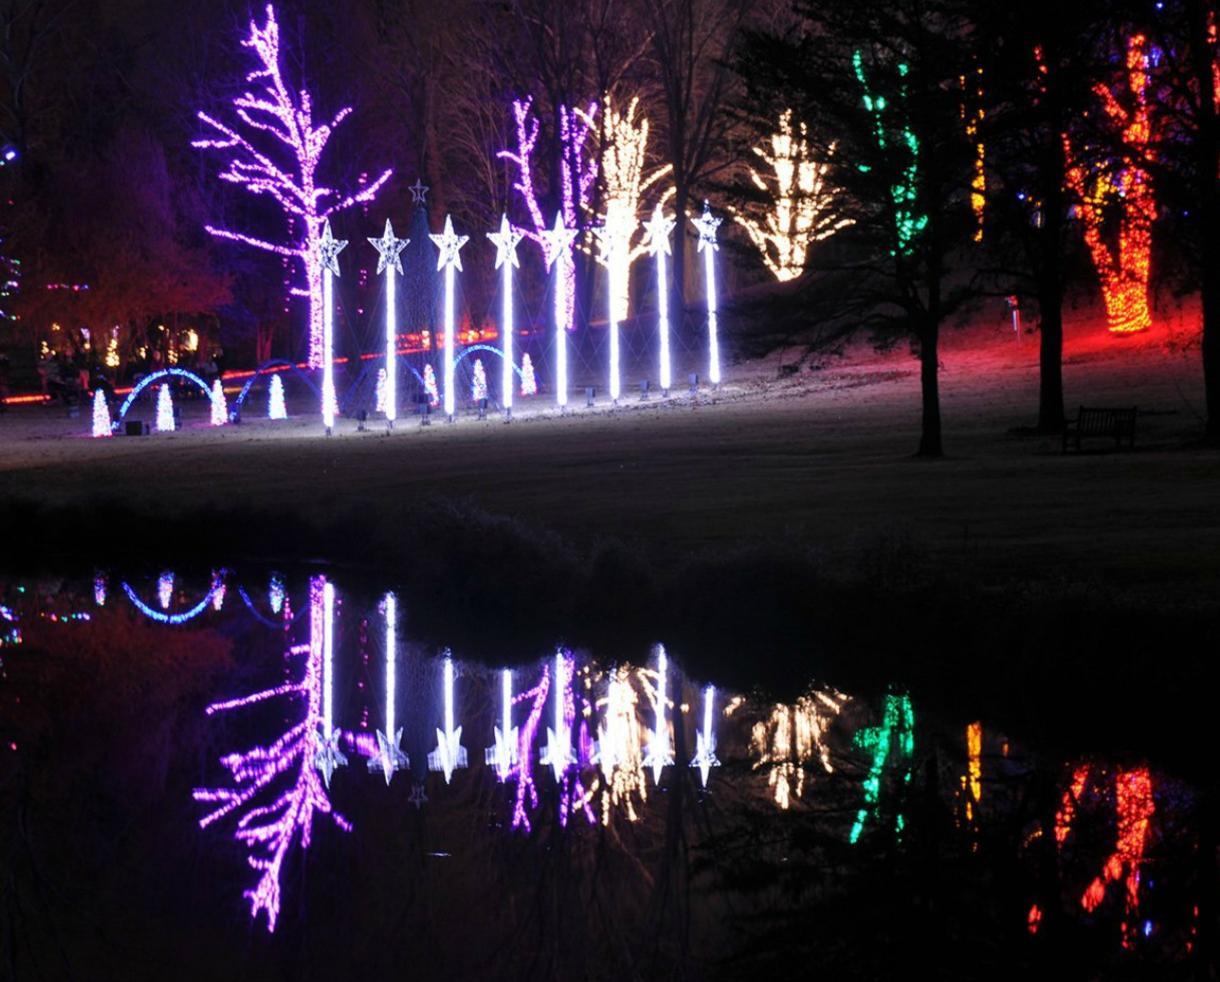 $16 for Meadowlark's Winter Walk of Lights Adult + Child Ticket - Vienna (31% Off)